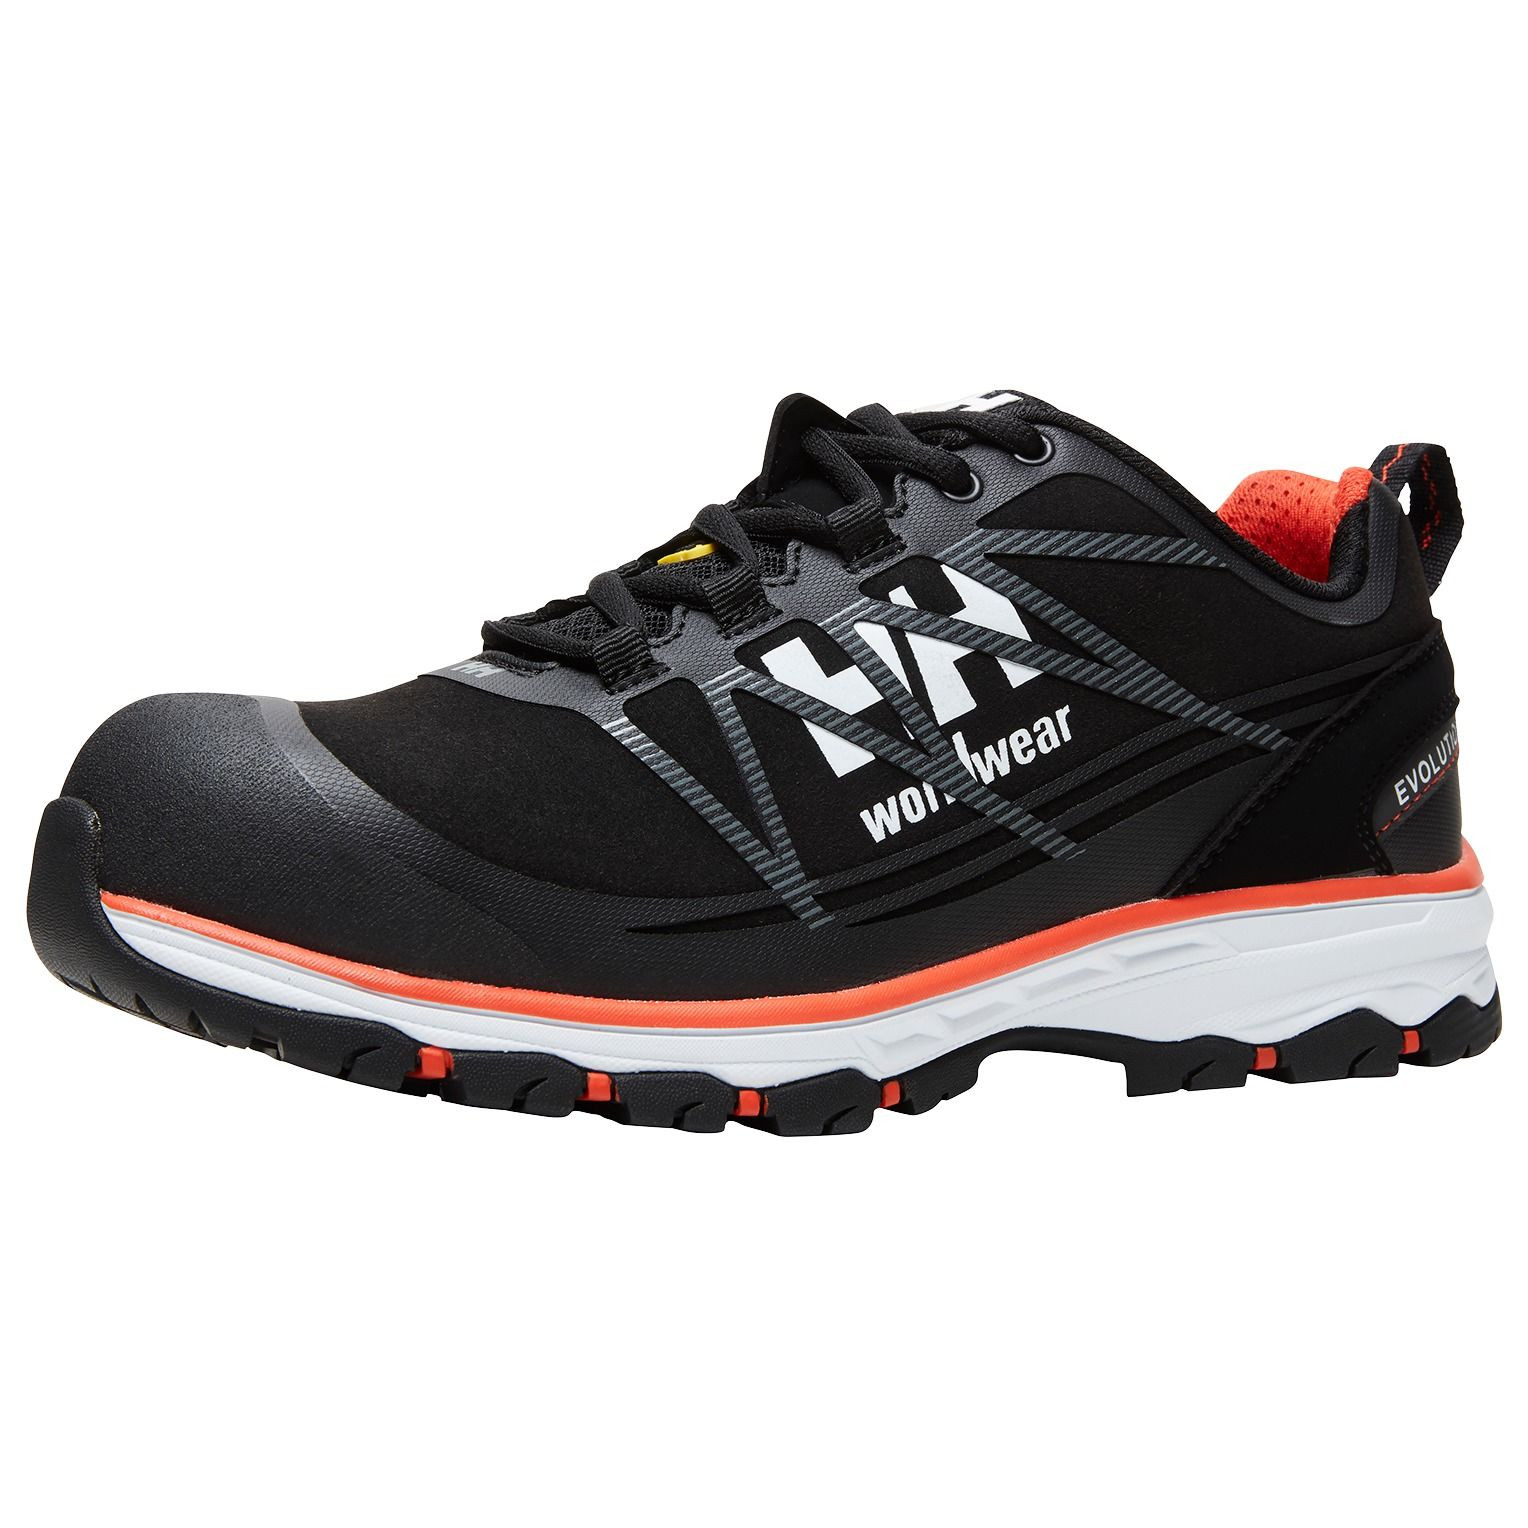 Демисезонные ботинки Helly Hansen Chelsea Evolution Low - 78224 (Black / Orange; 41)